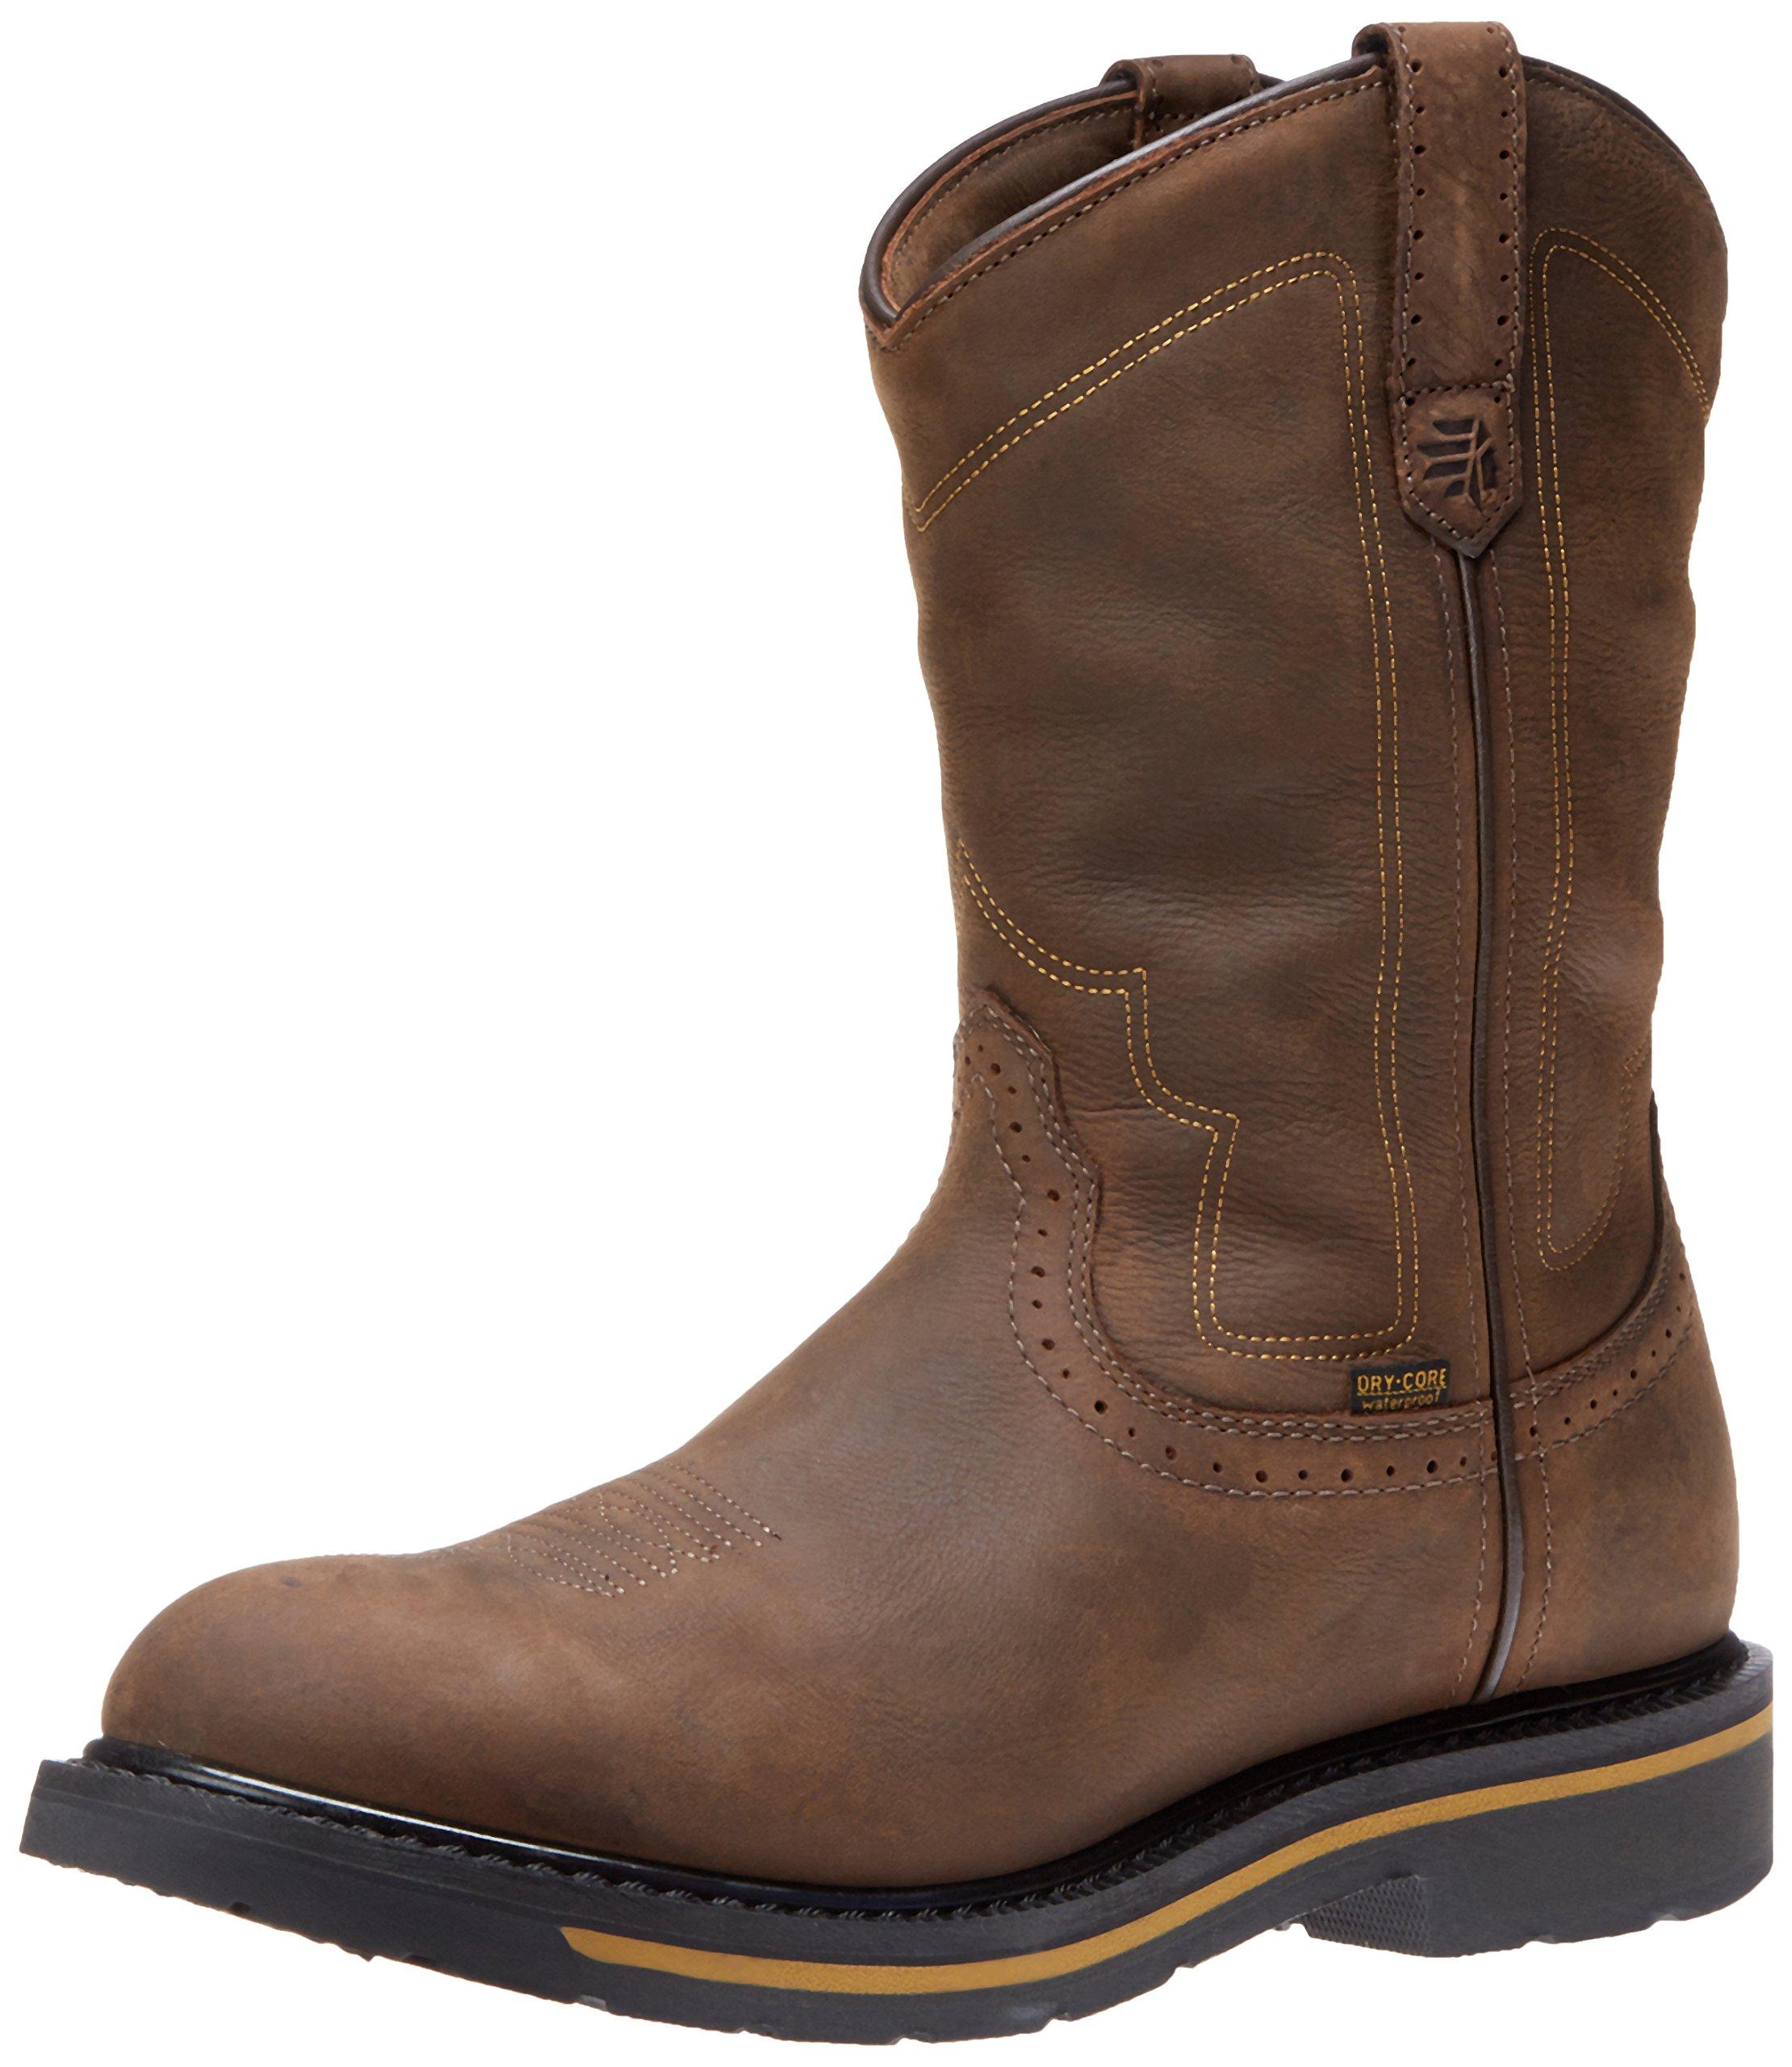 Lacrosse Men's Tallgrass Western Toe 11 Inch Work Boot,Brown,10 W US